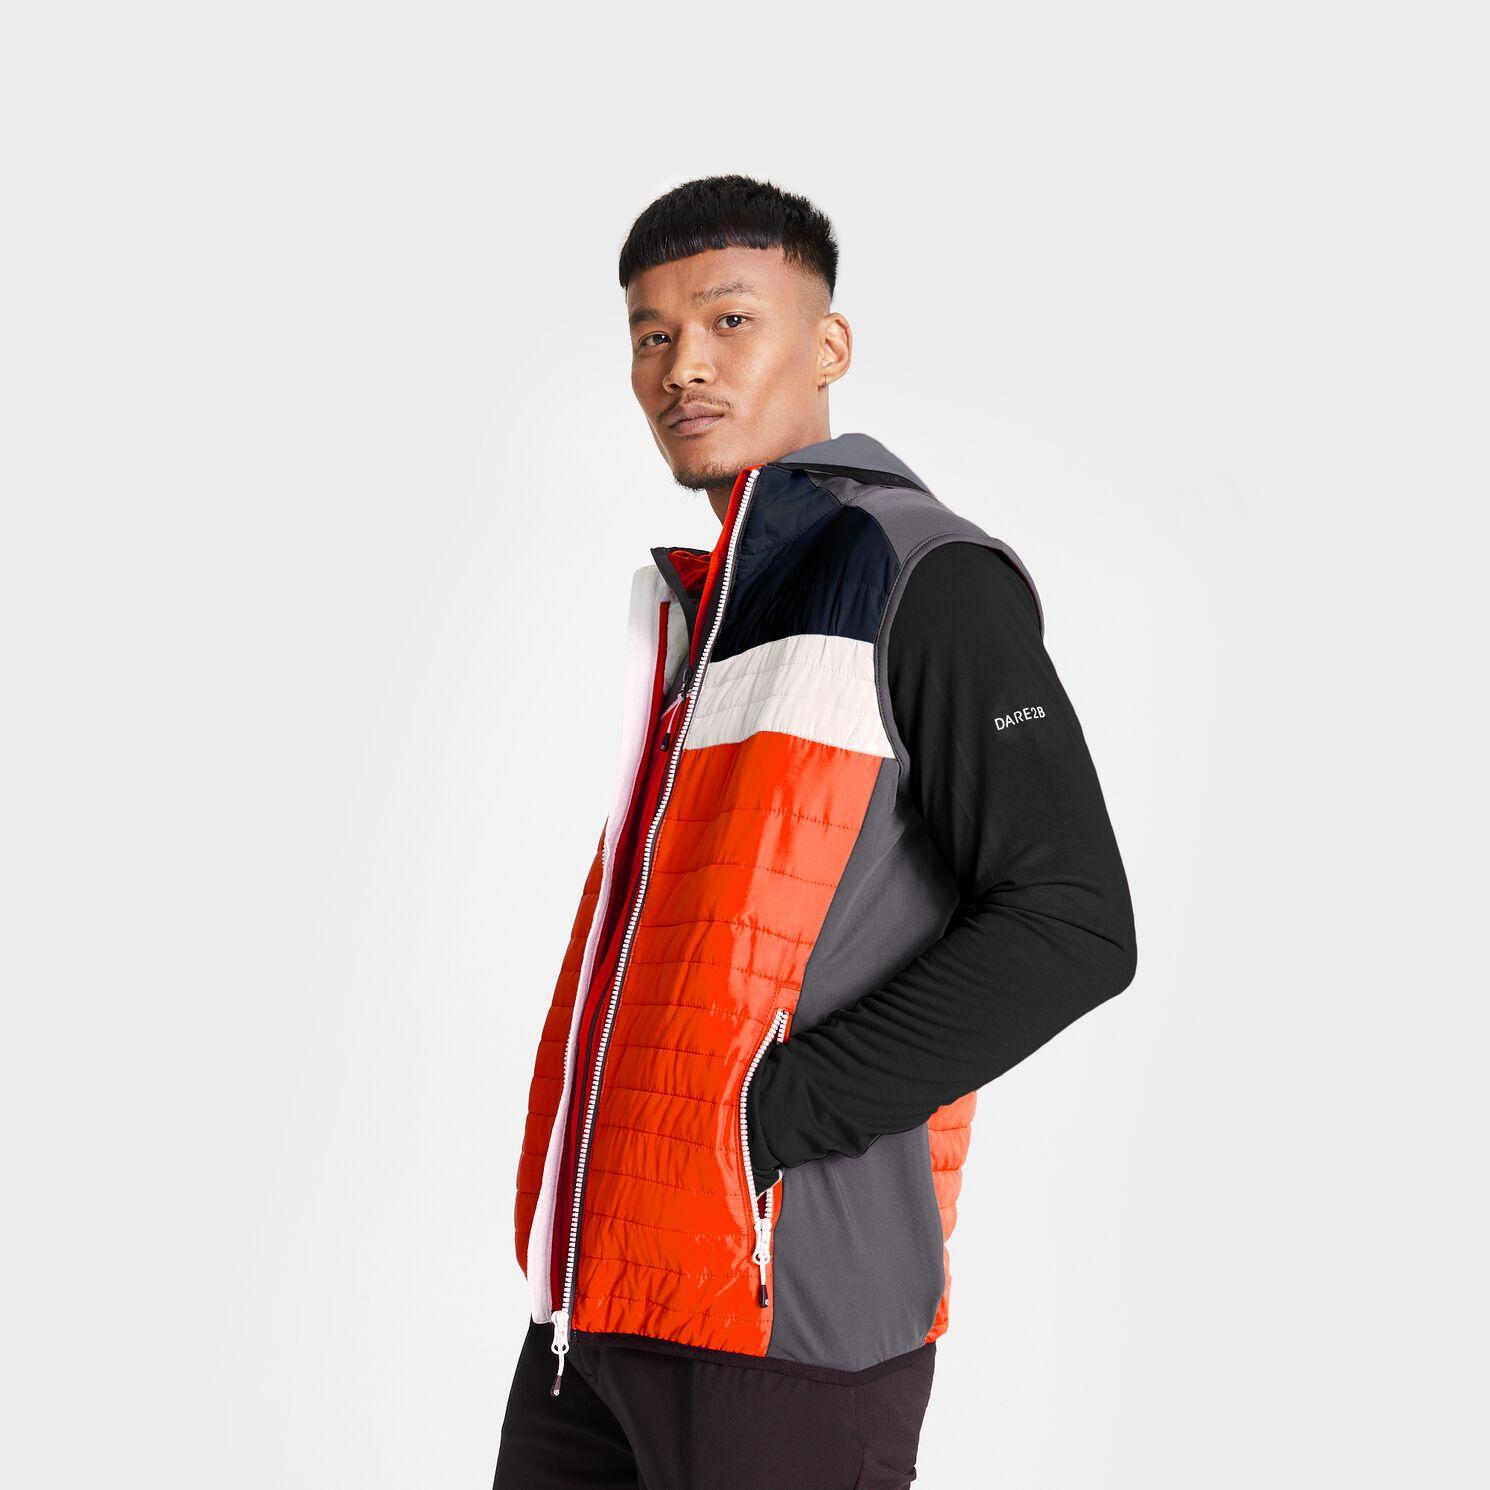 Model wearing a orange, grey and black hybrid jacket